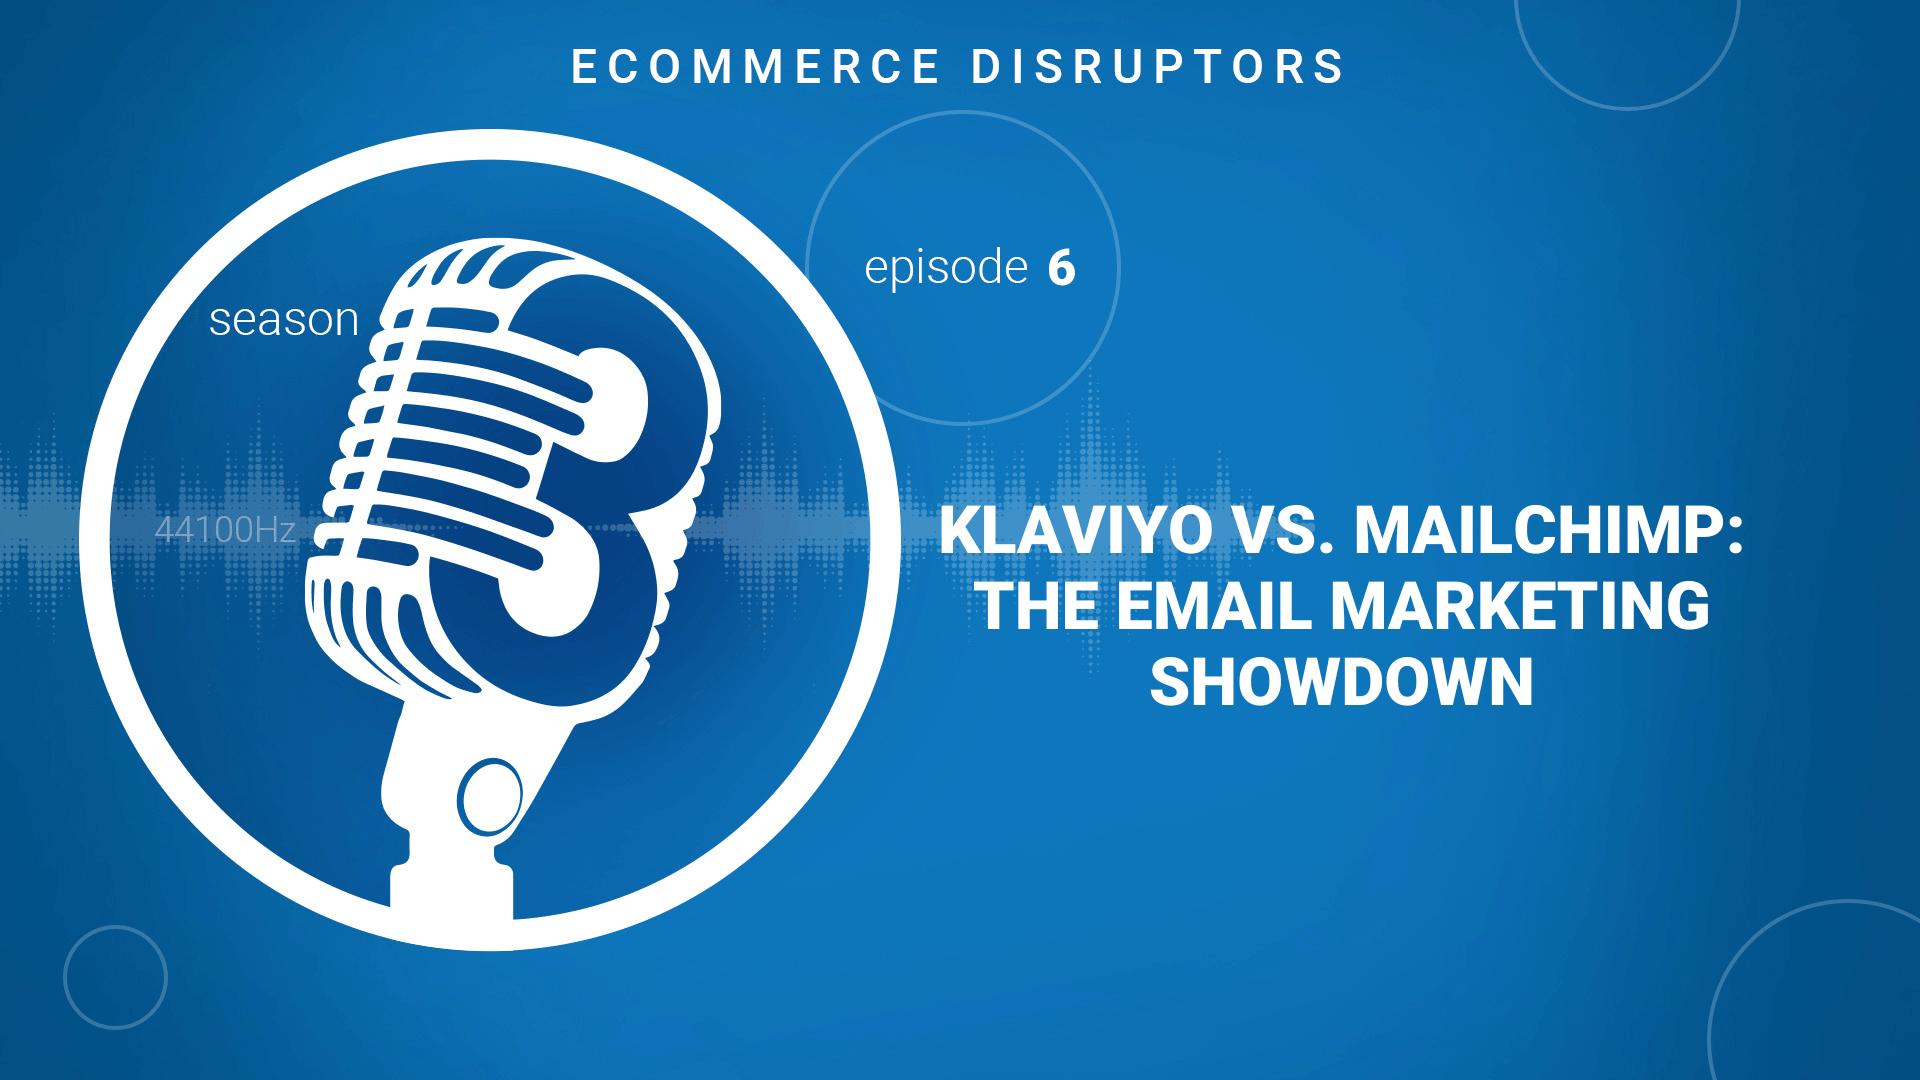 Klaviyo vs. Mailchimp: The email marketing showdown